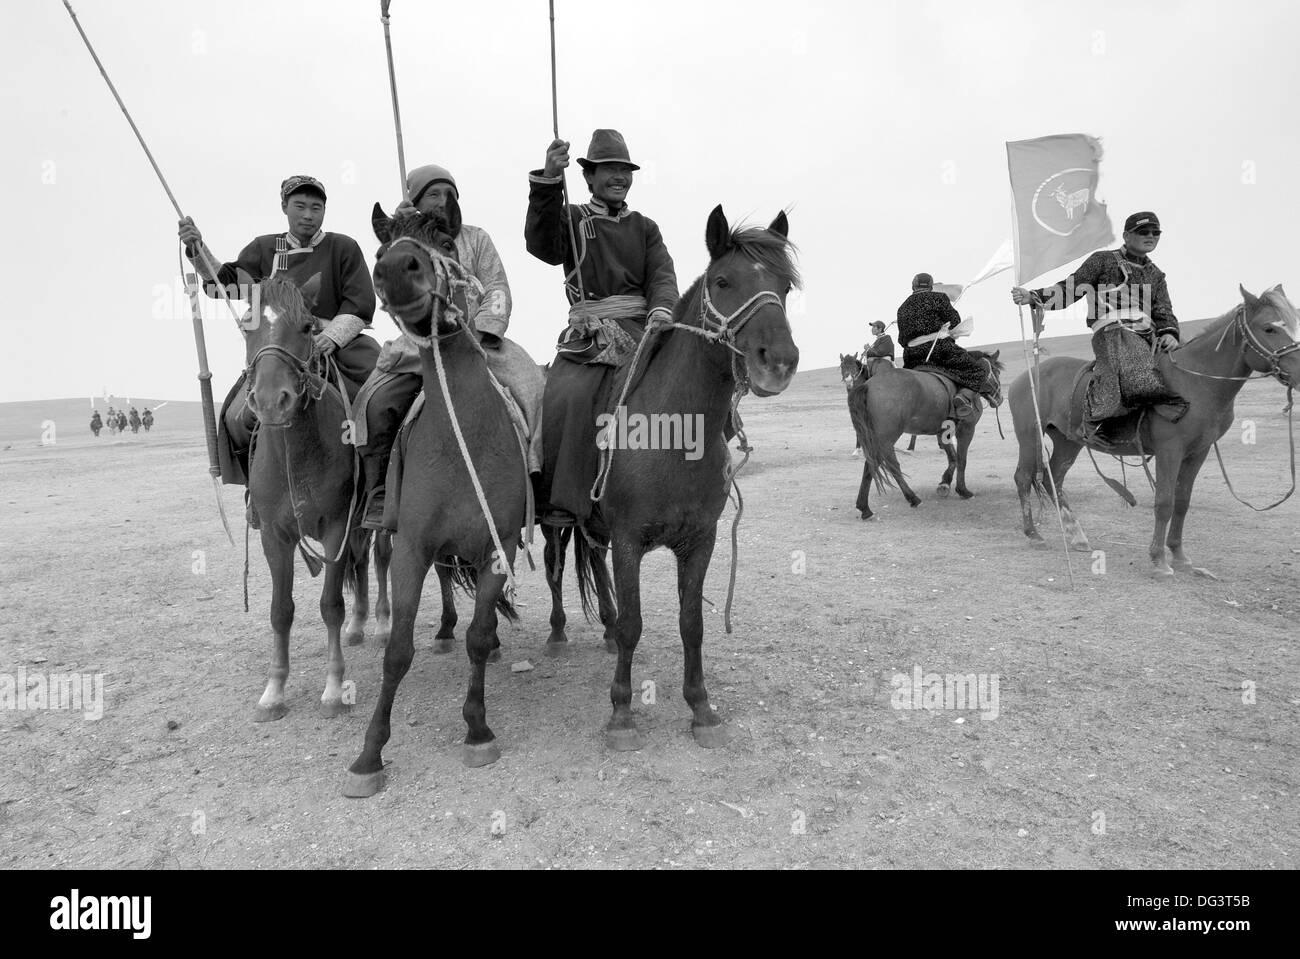 Mongolian horsemen, Xinyou grassland, Inner Mongolia, China - Stock Image